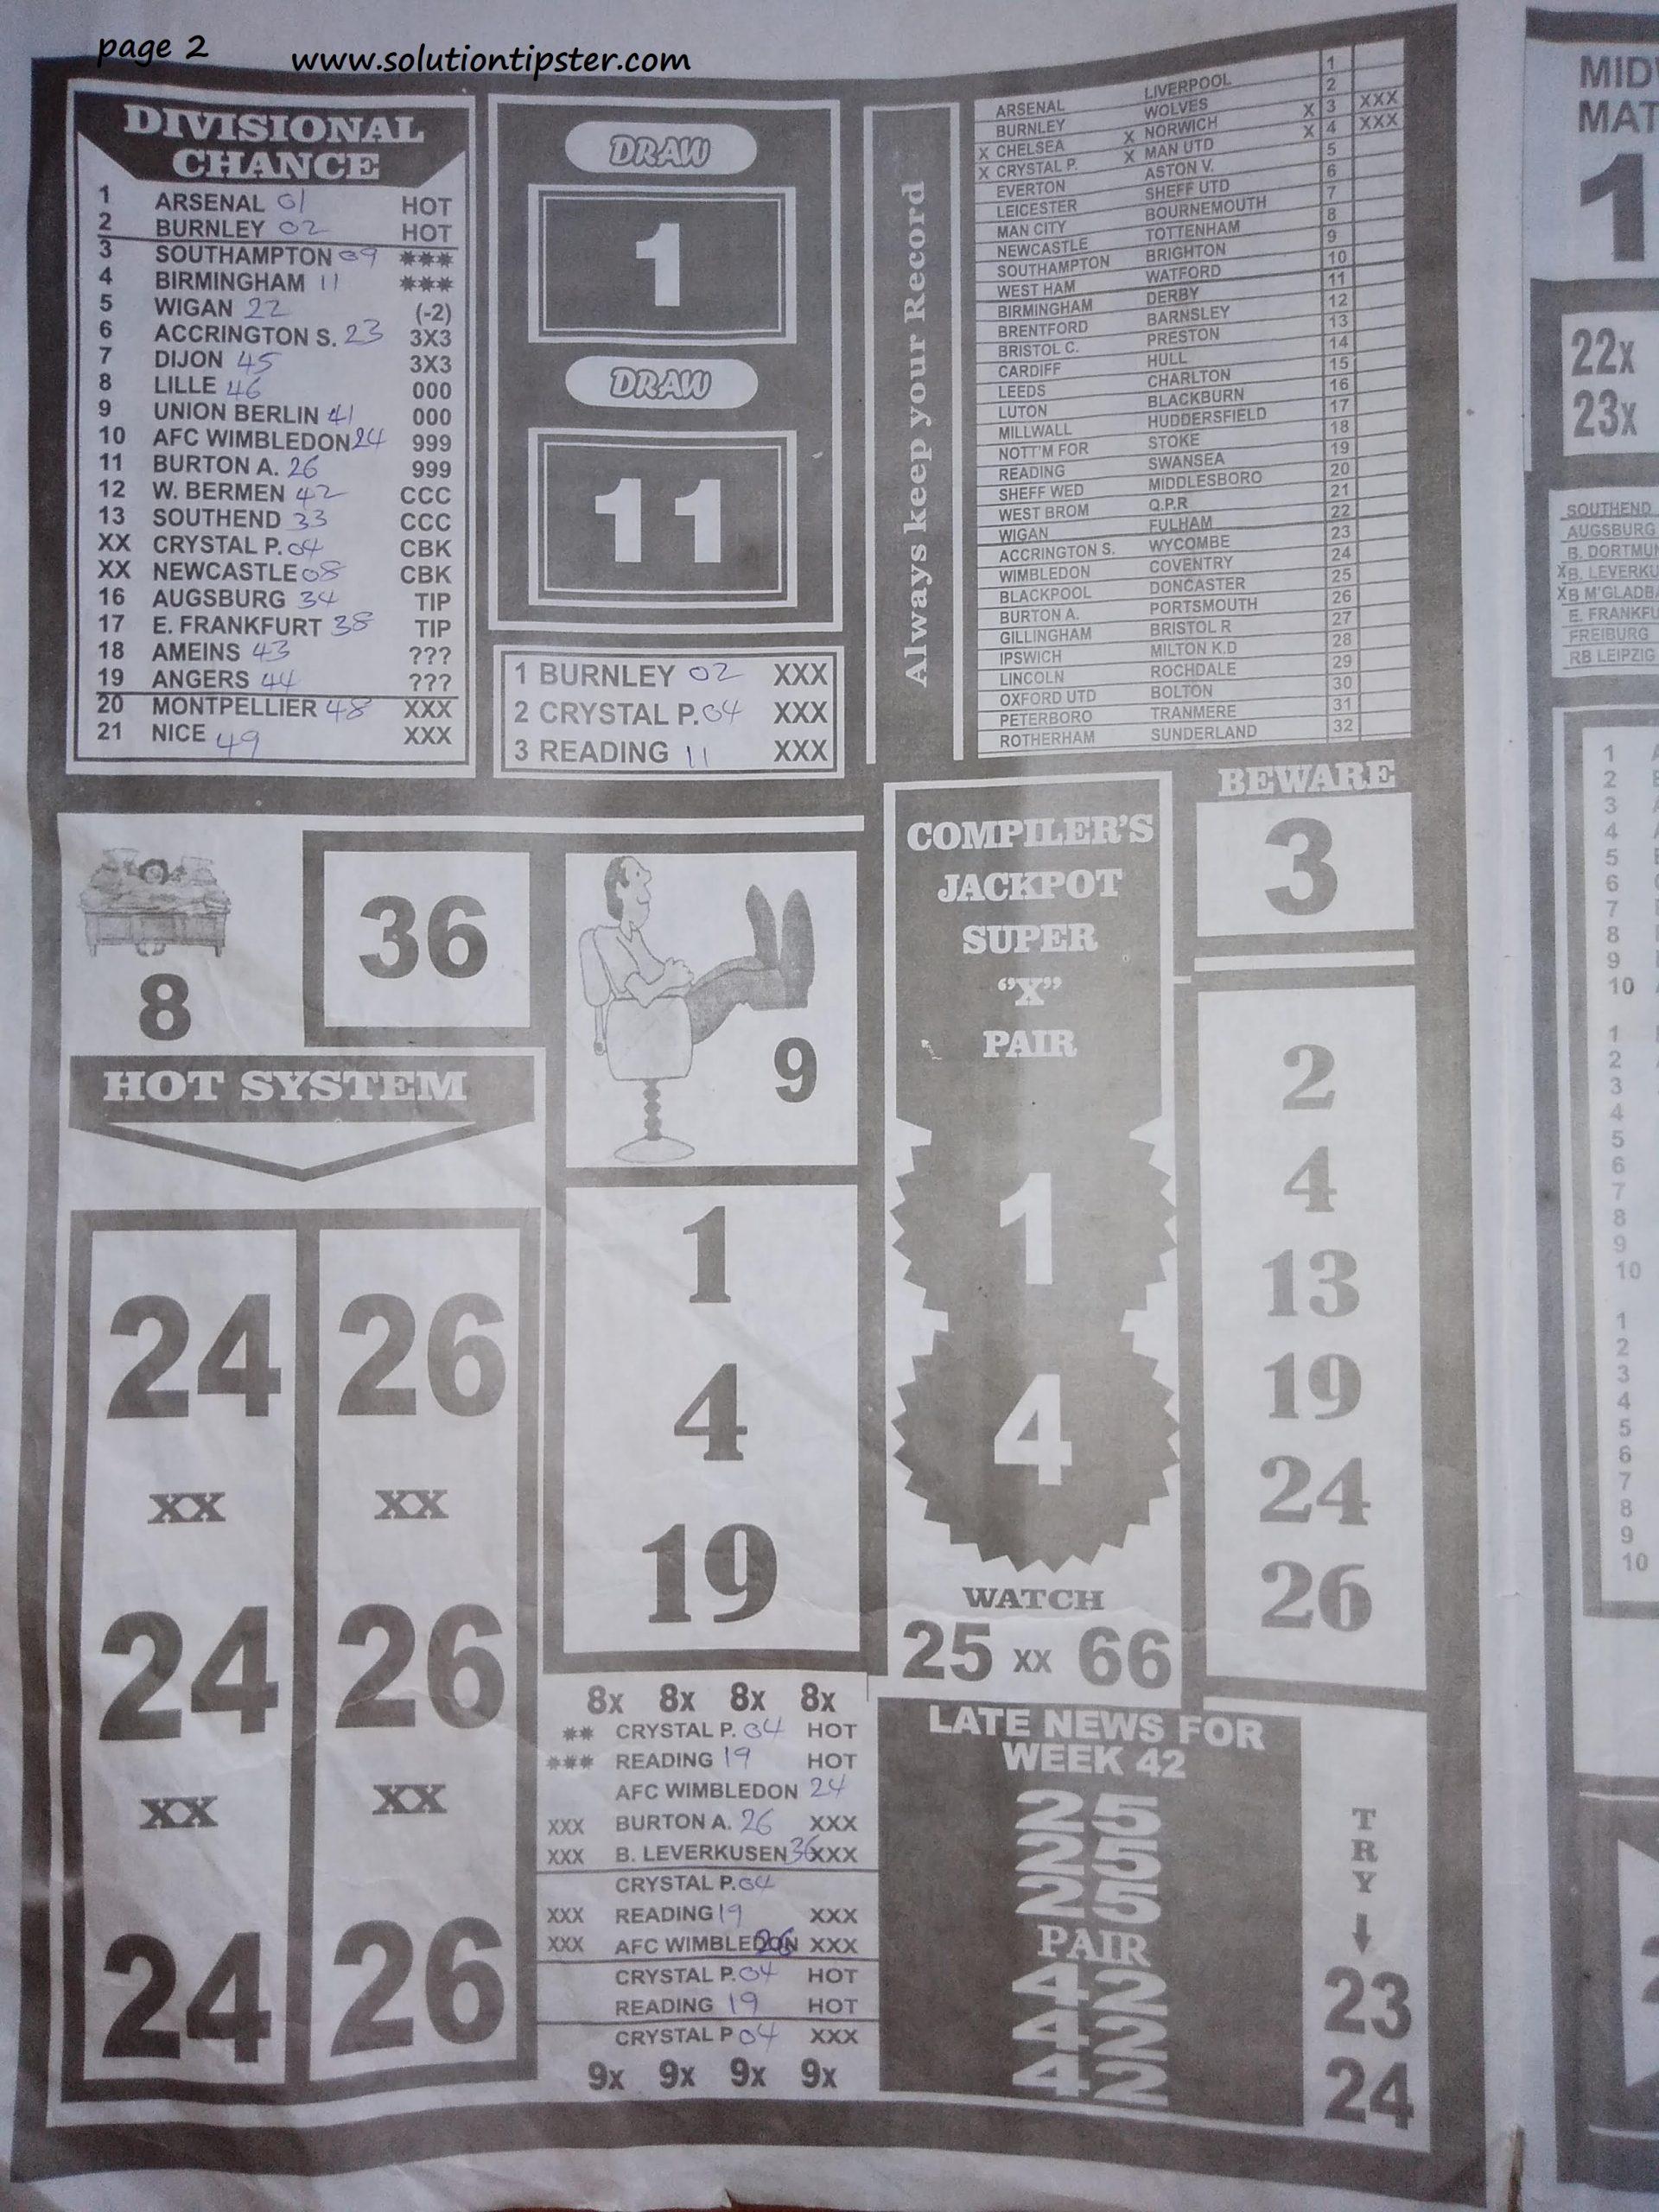 Week 43 pool betting hits on the street bet